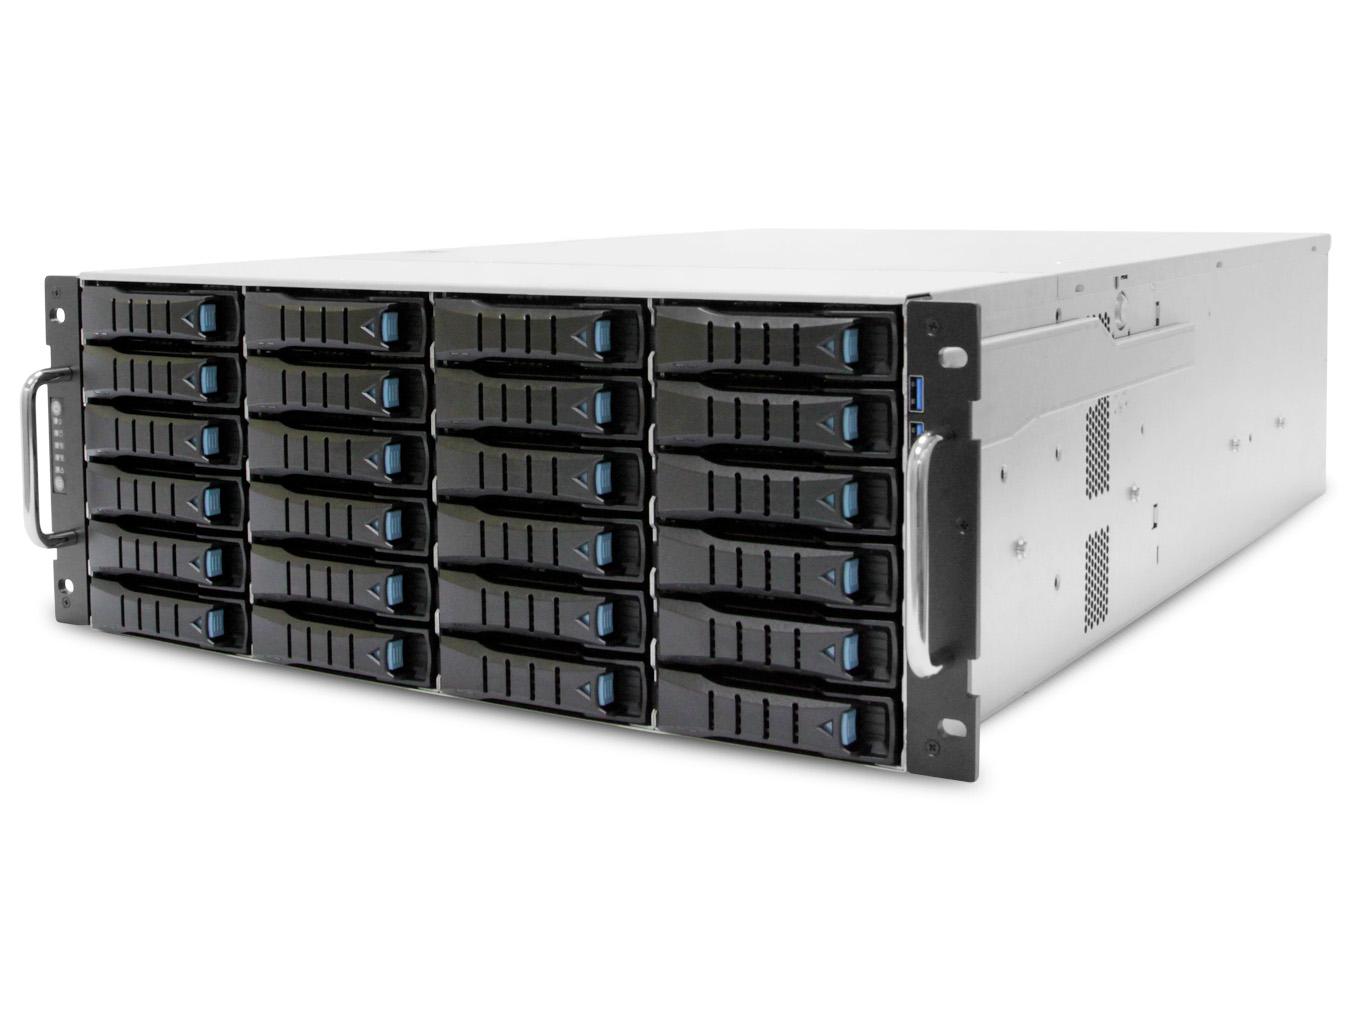 AIC SB401-VG XP1-S401VG01 4U 24-Bay Storage Server